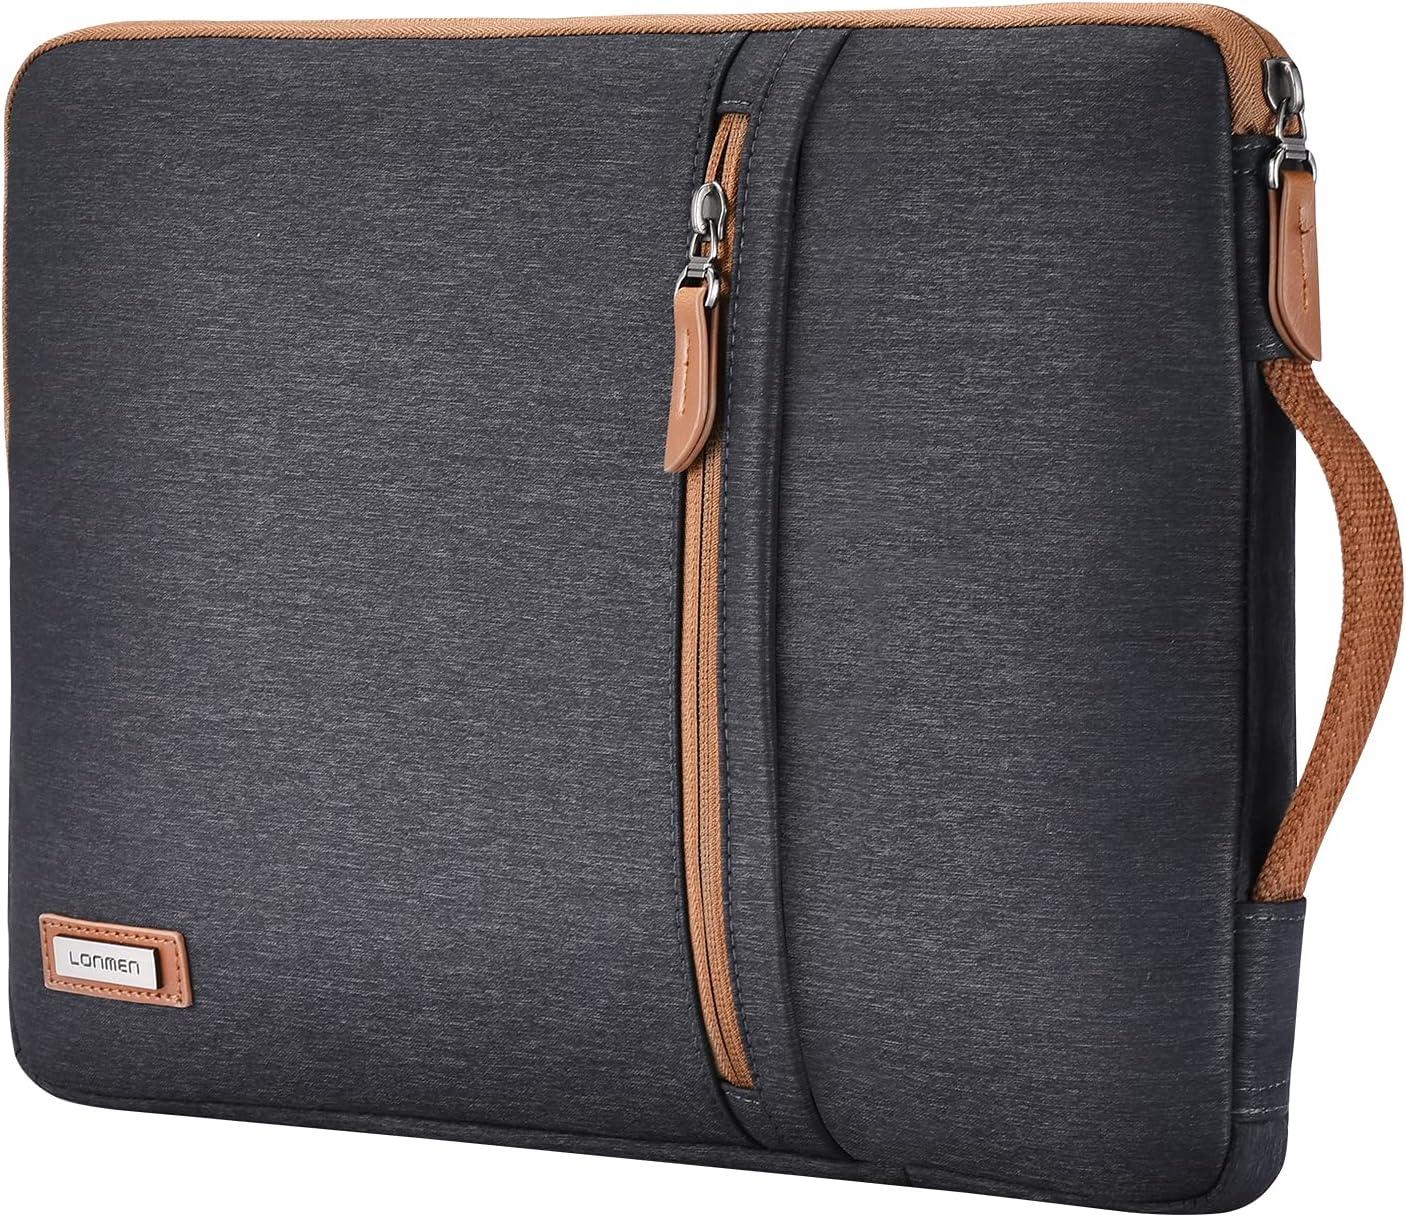 LONMEN 15.6 inch Laptop Sleeve Case Water-Resistant Notebook Handle Bag for Flex 4/Yoga 720/Ideapad 330 321S Laptop/ThinkPad P1/HP Envy x360 15/ASUS ROG Zephyrus S/Dell Latitude 3590